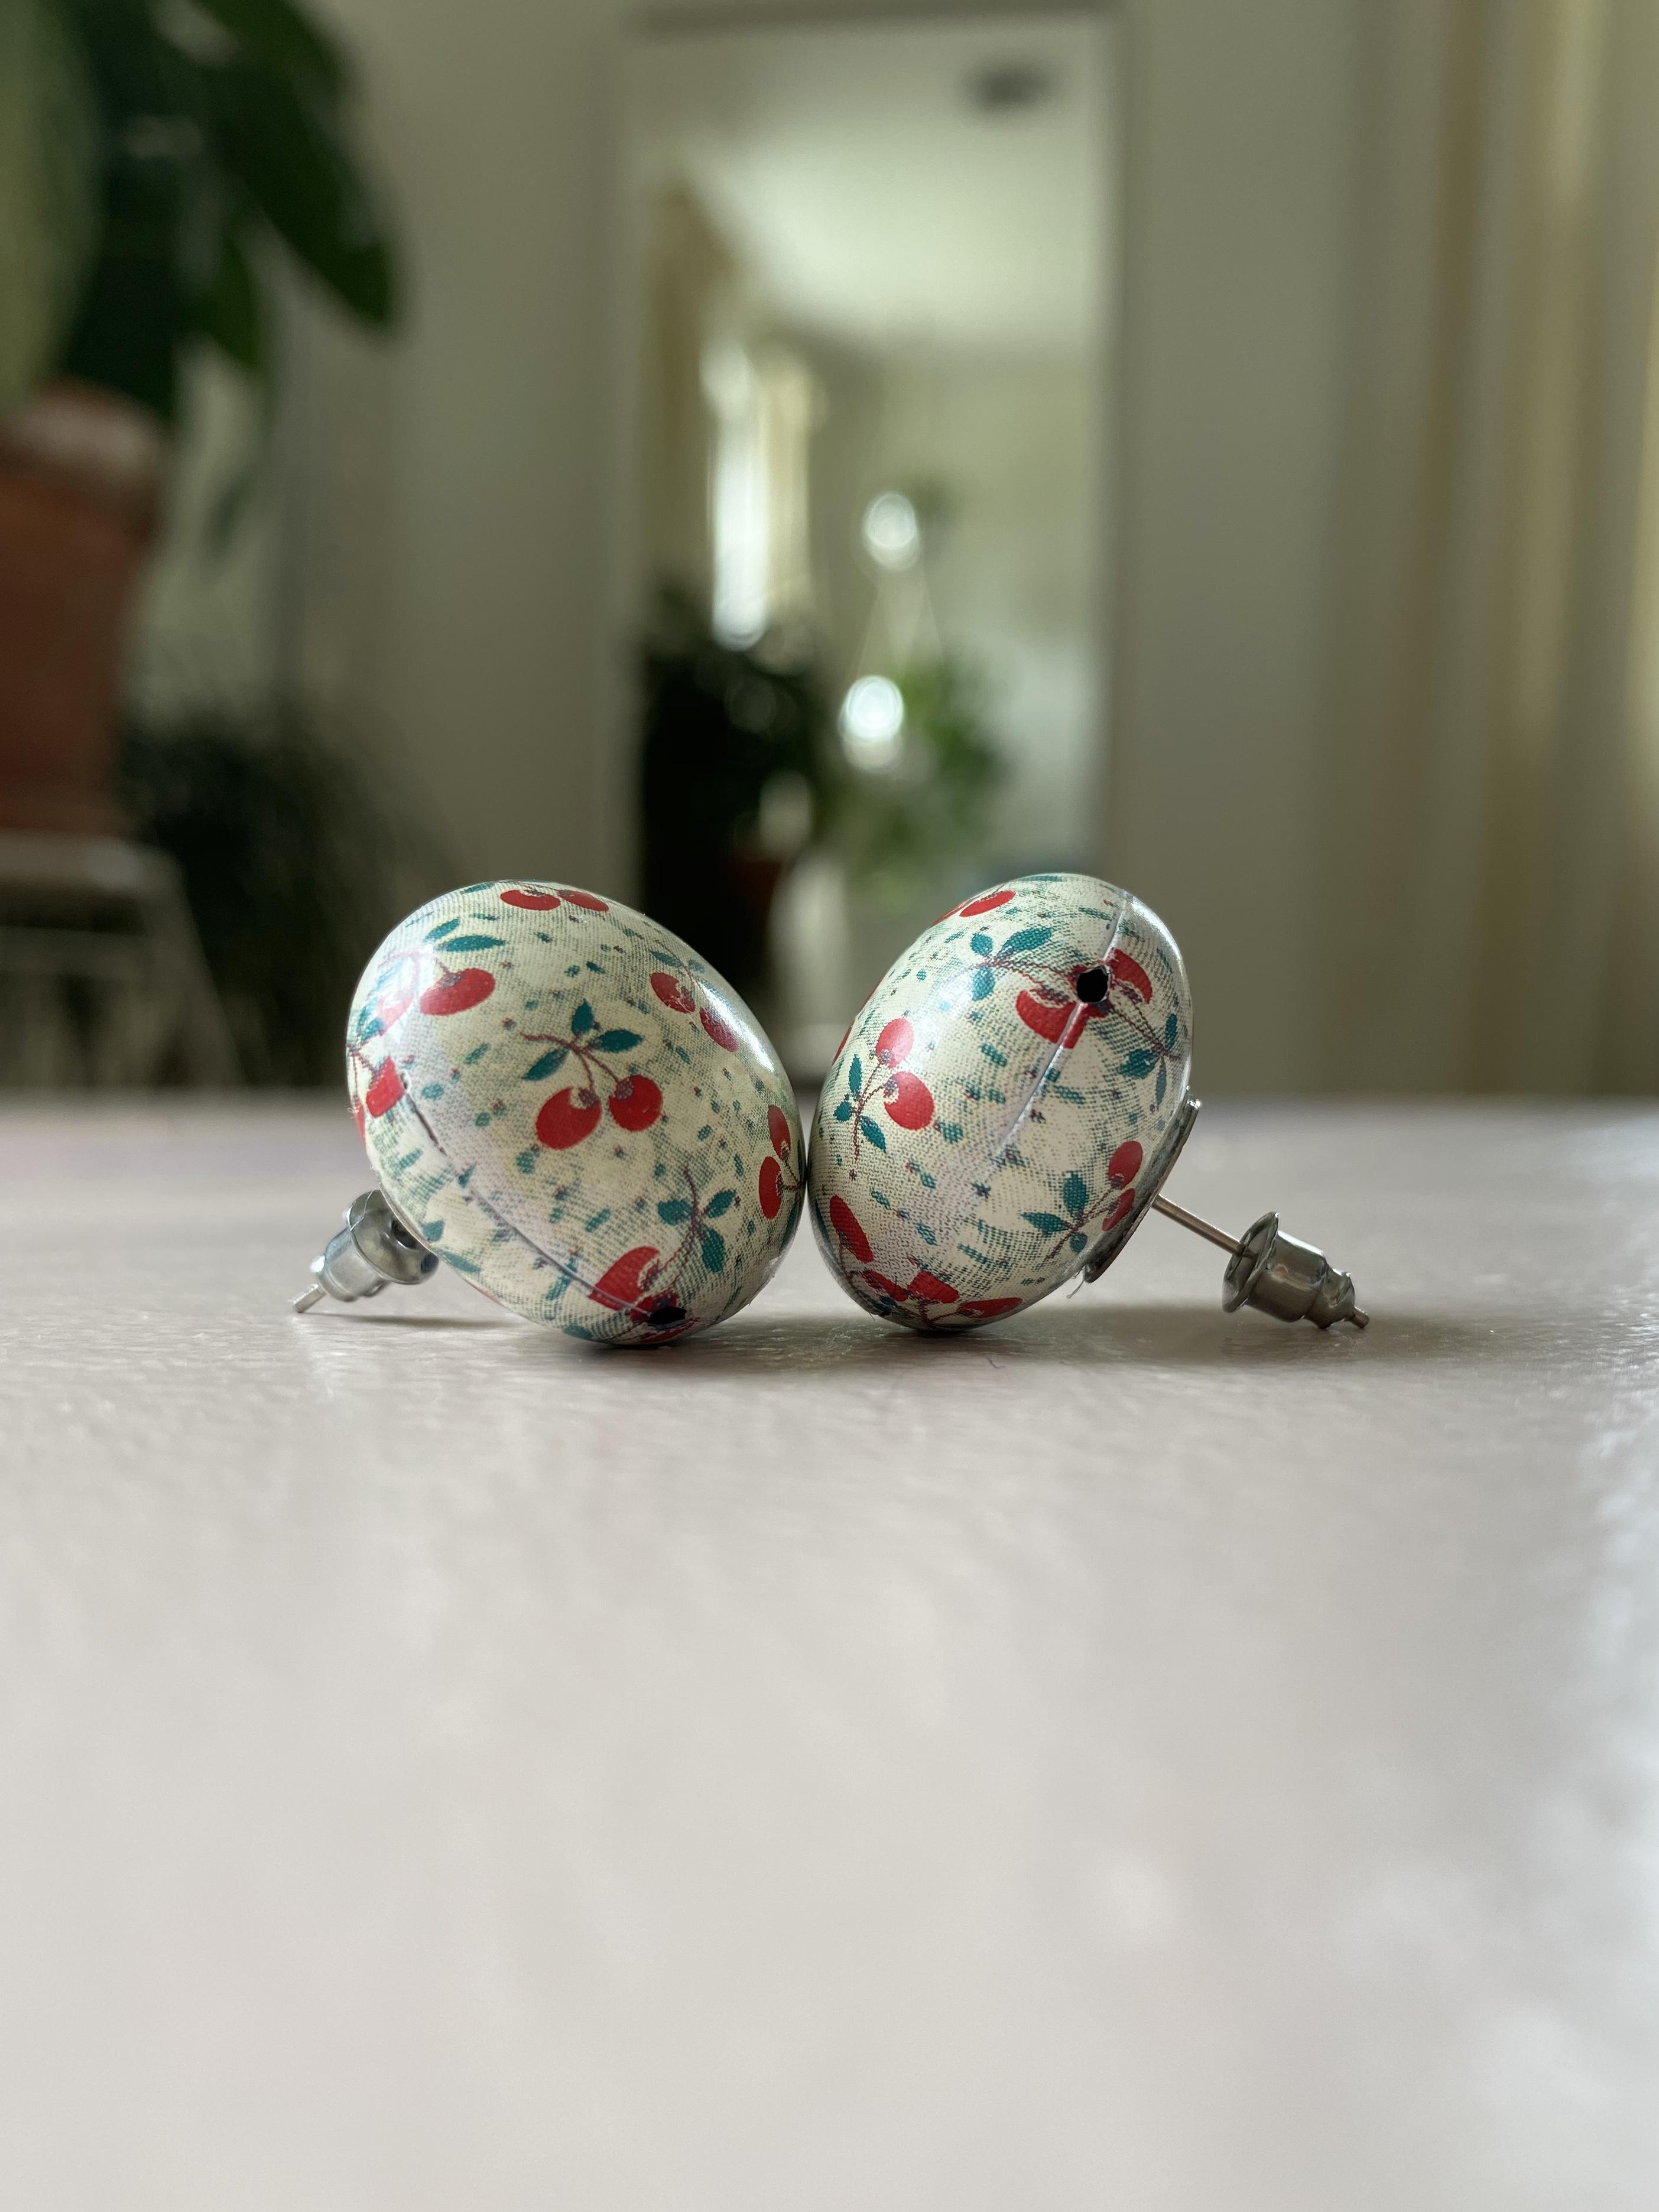 Stufmuffin Cherry Earrings